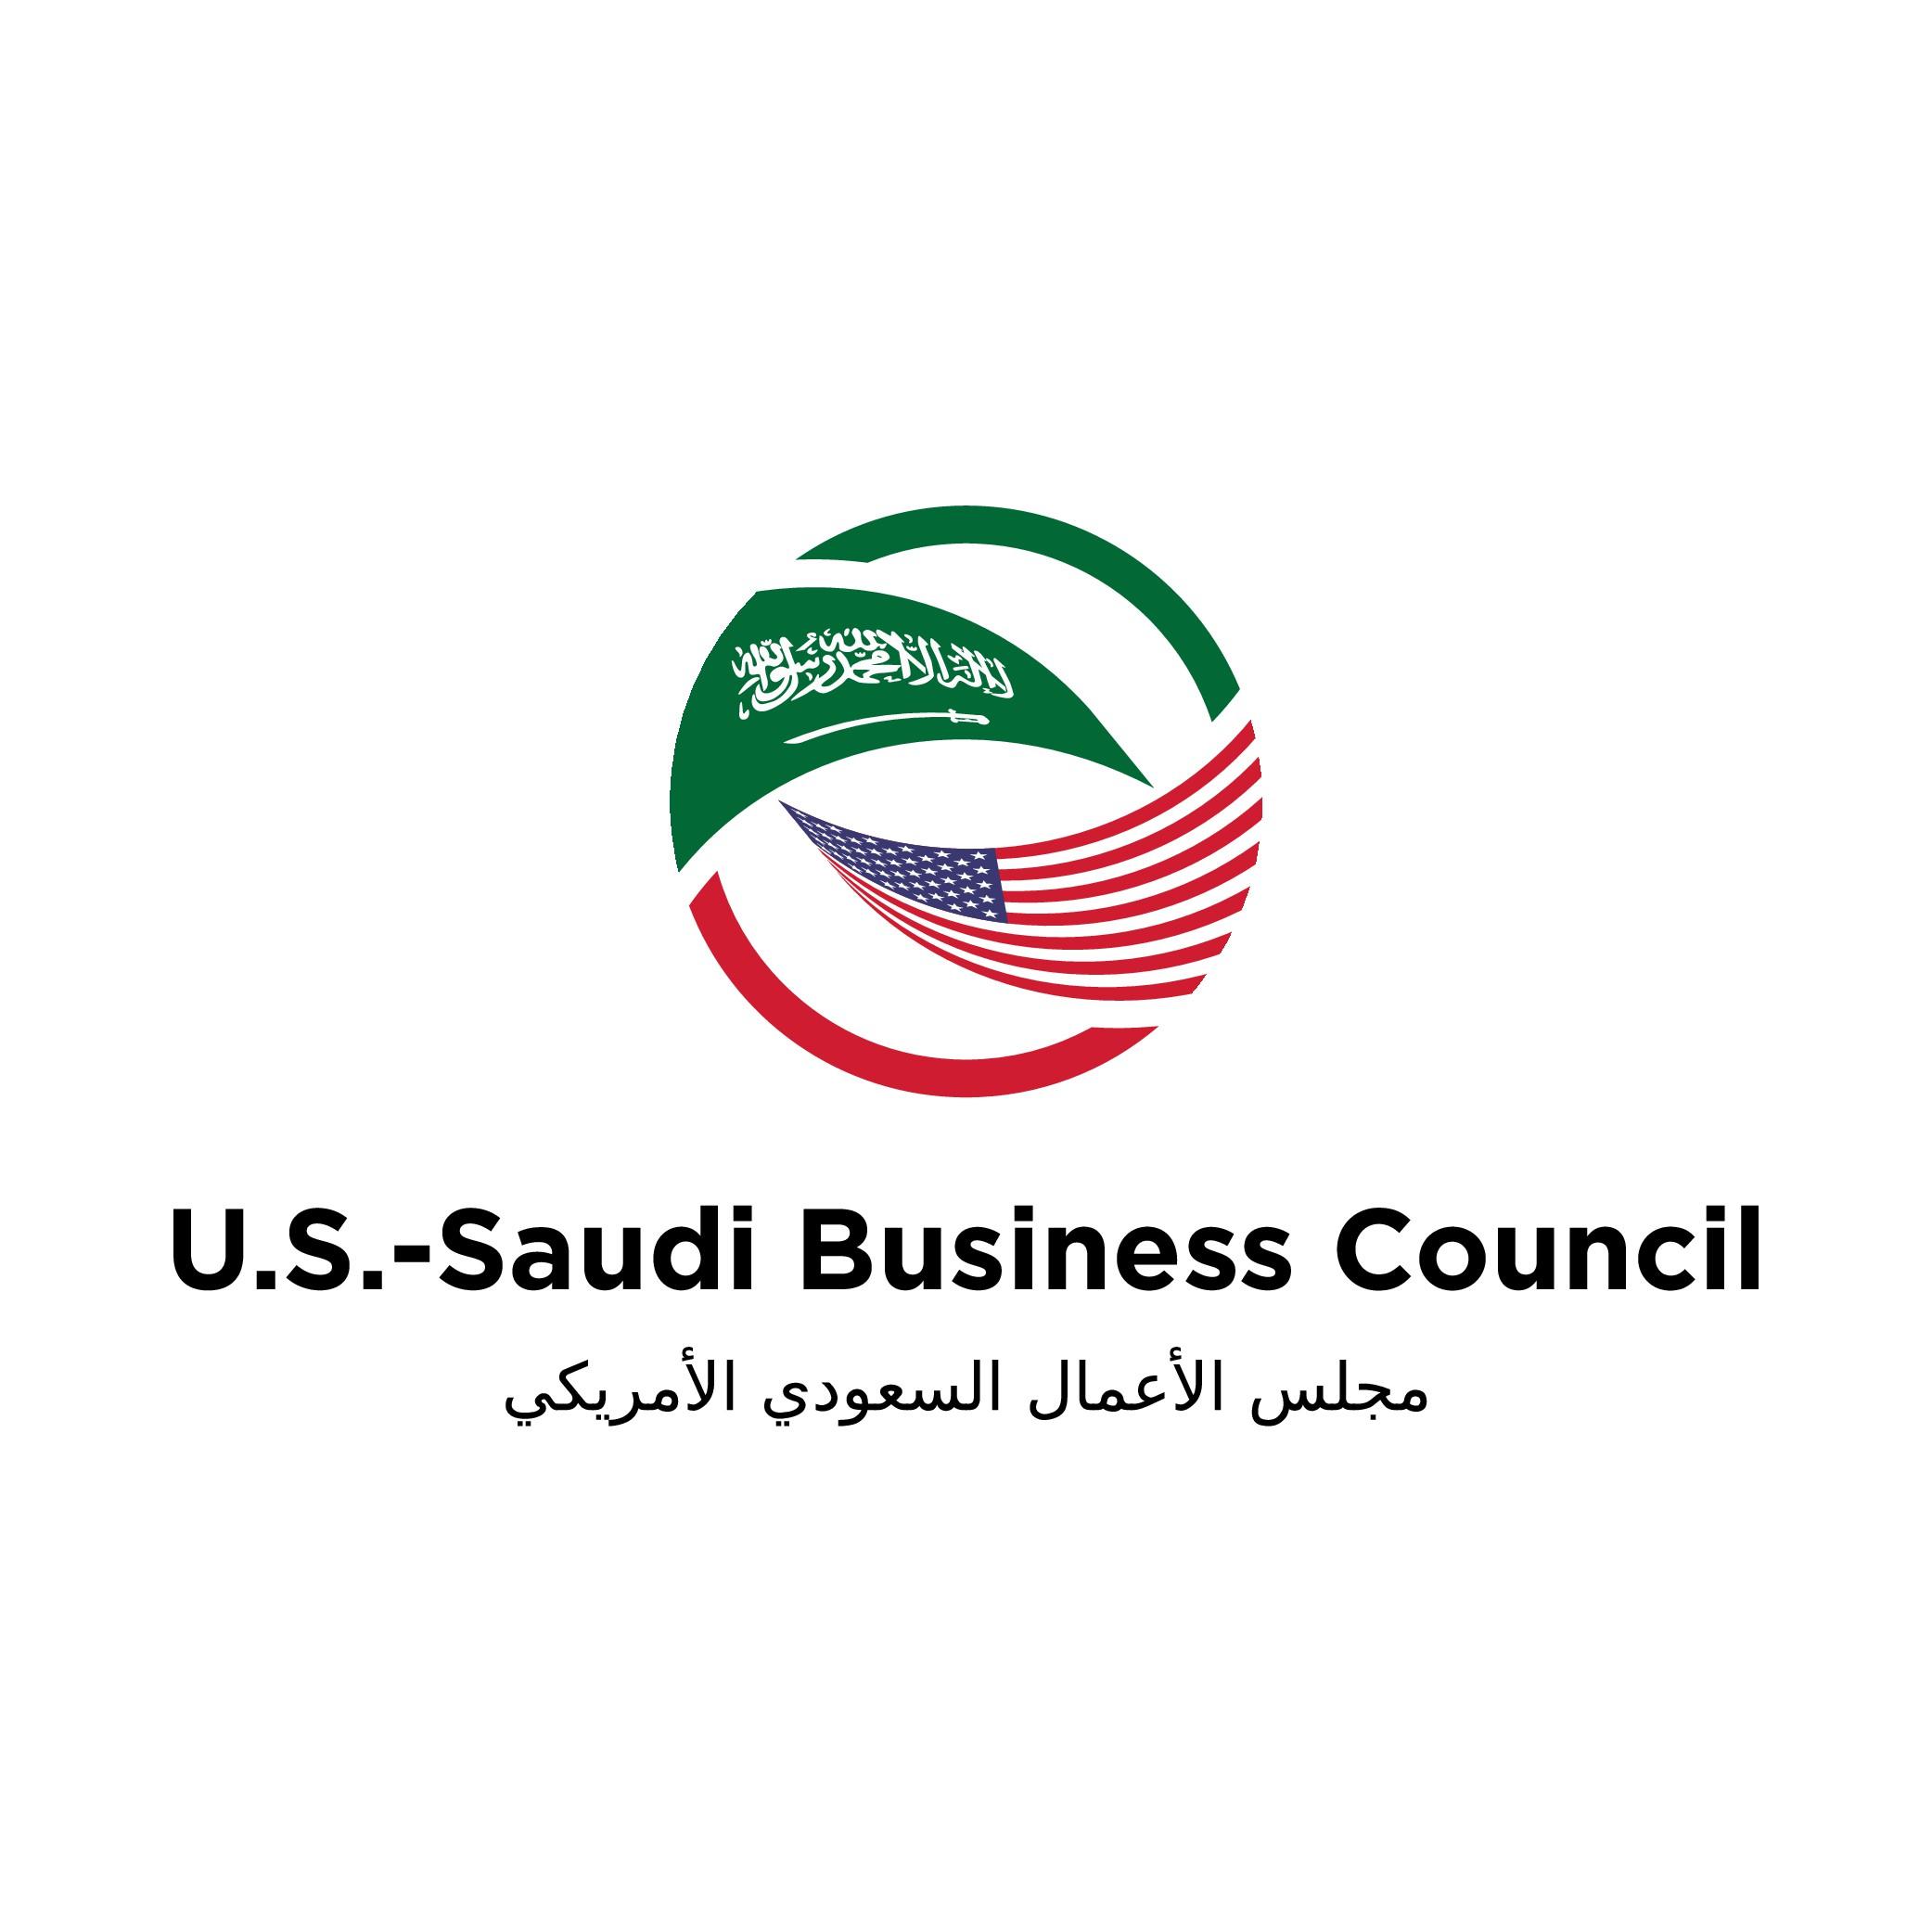 Modern/Professional Logo Needed for Bilateral Organization